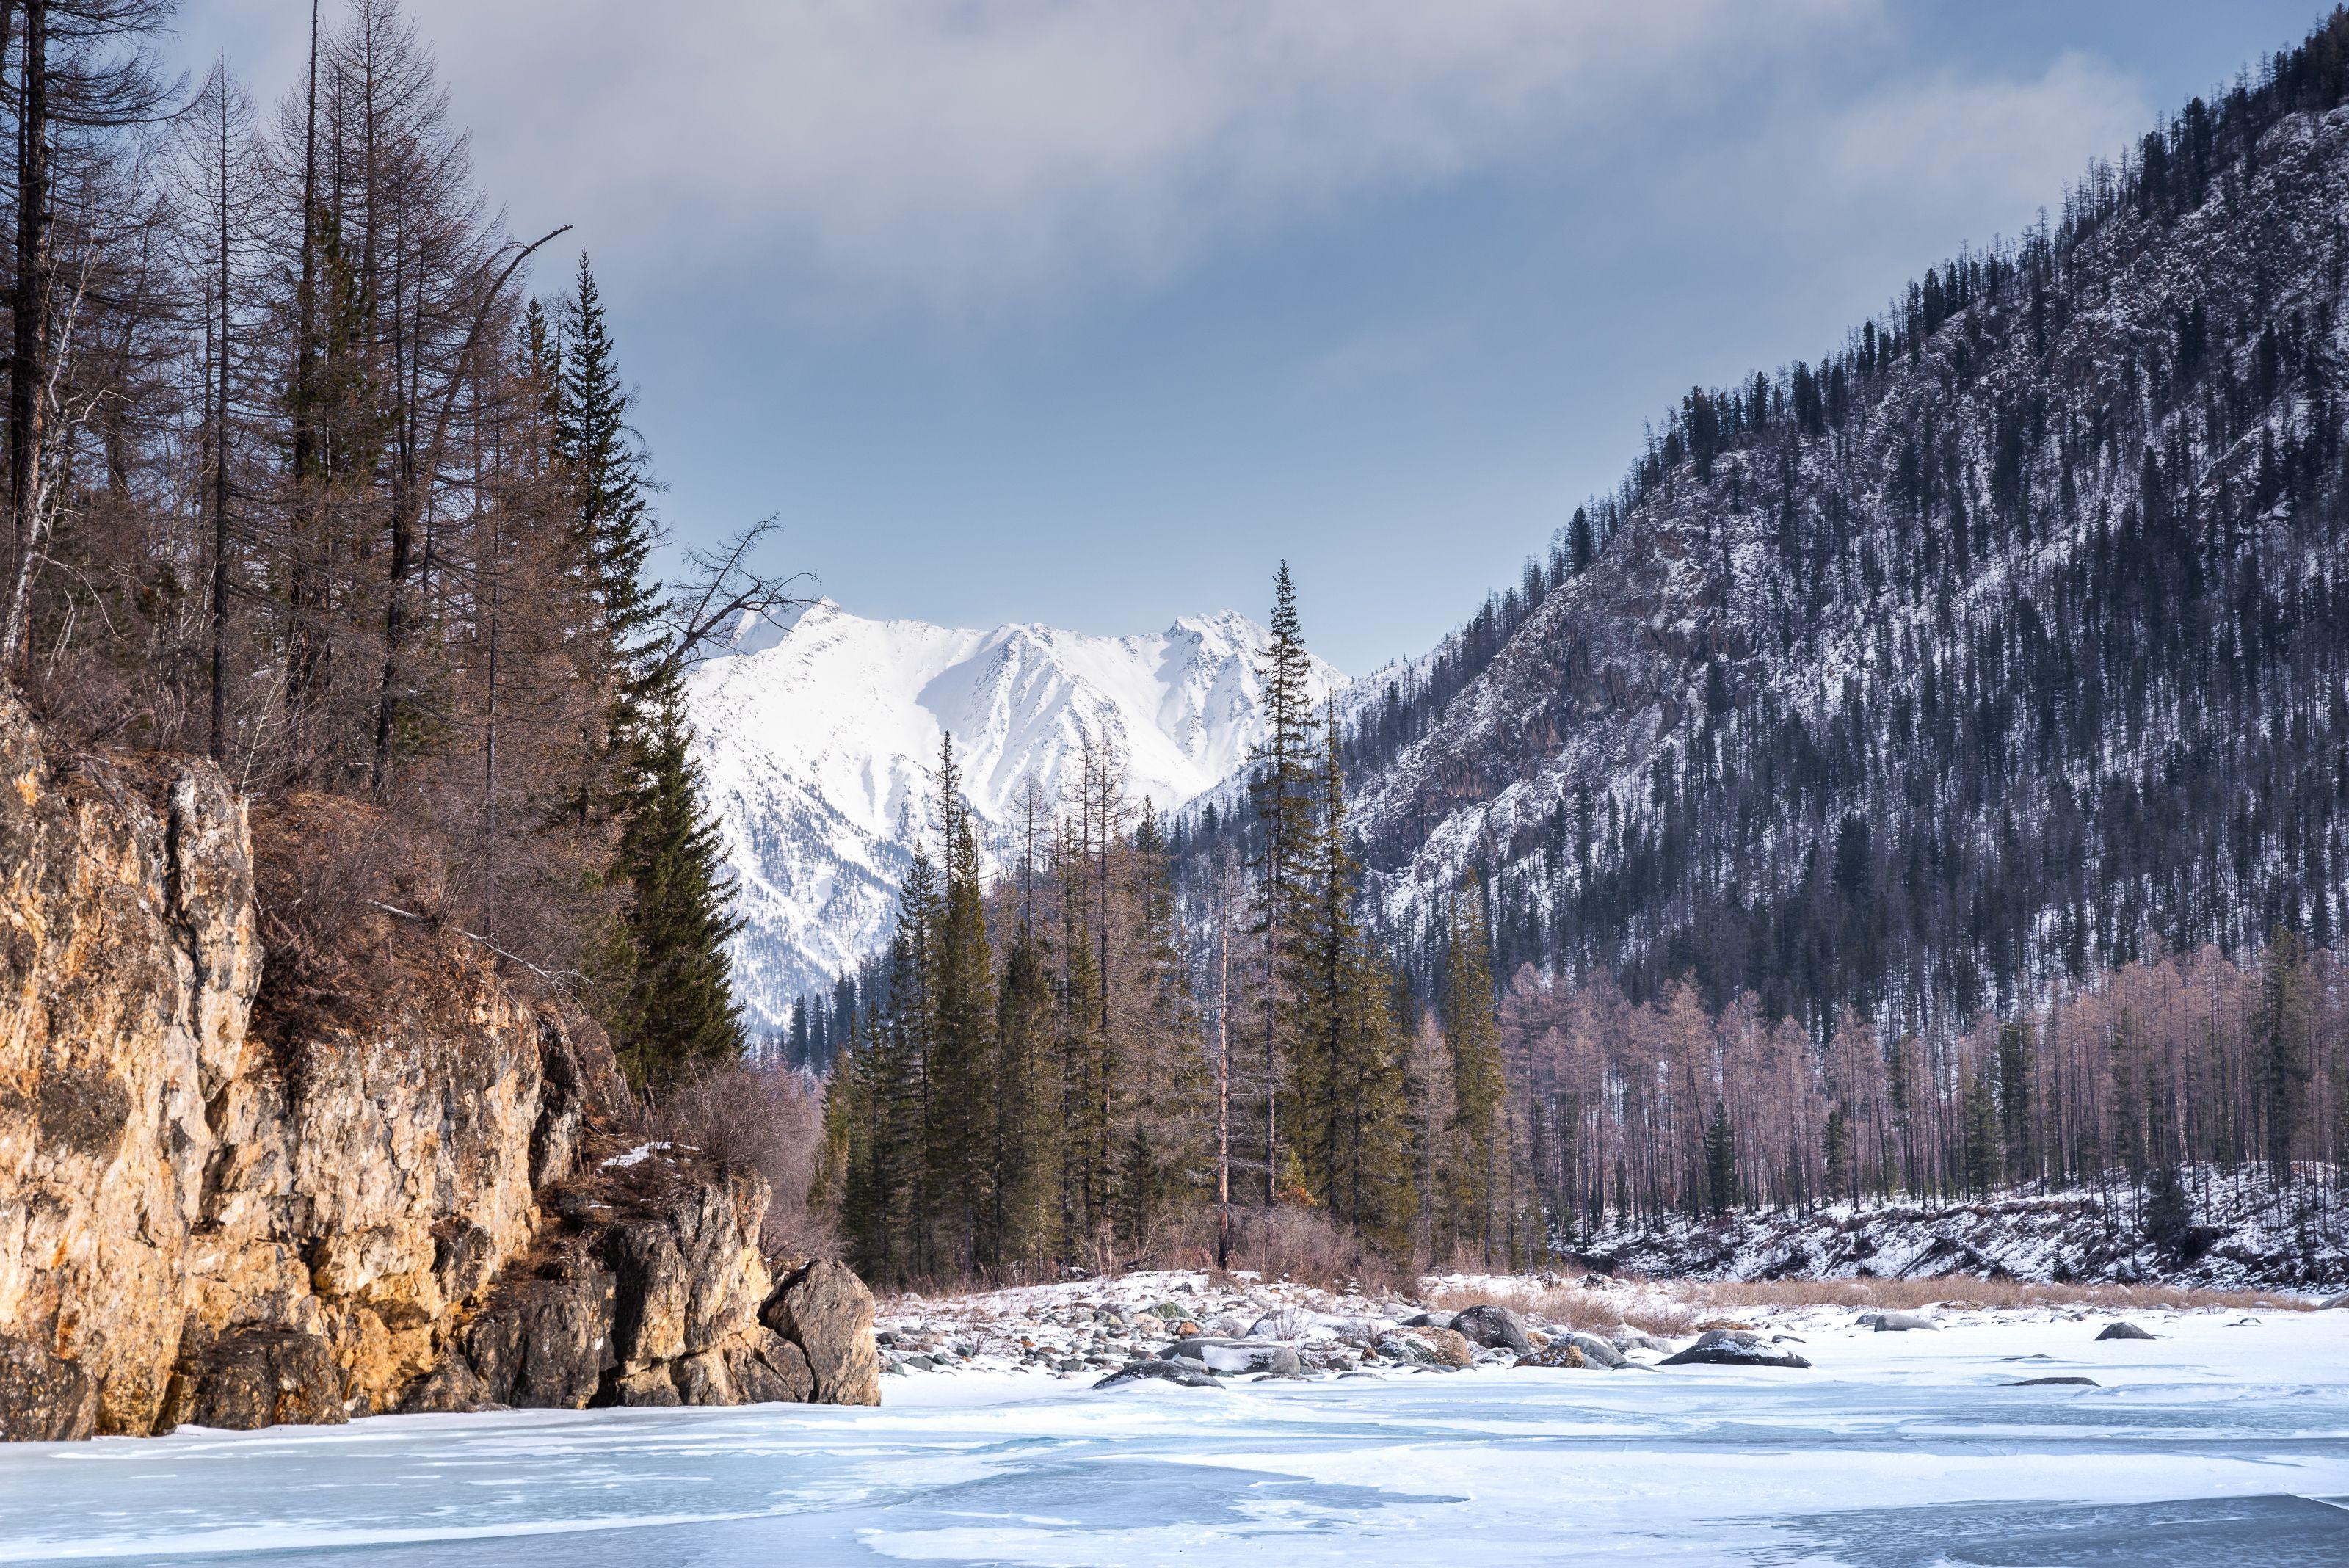 Саяны, Тунки, Тункинские гольцы, горы, зима, Evgeniy Khilkevitch